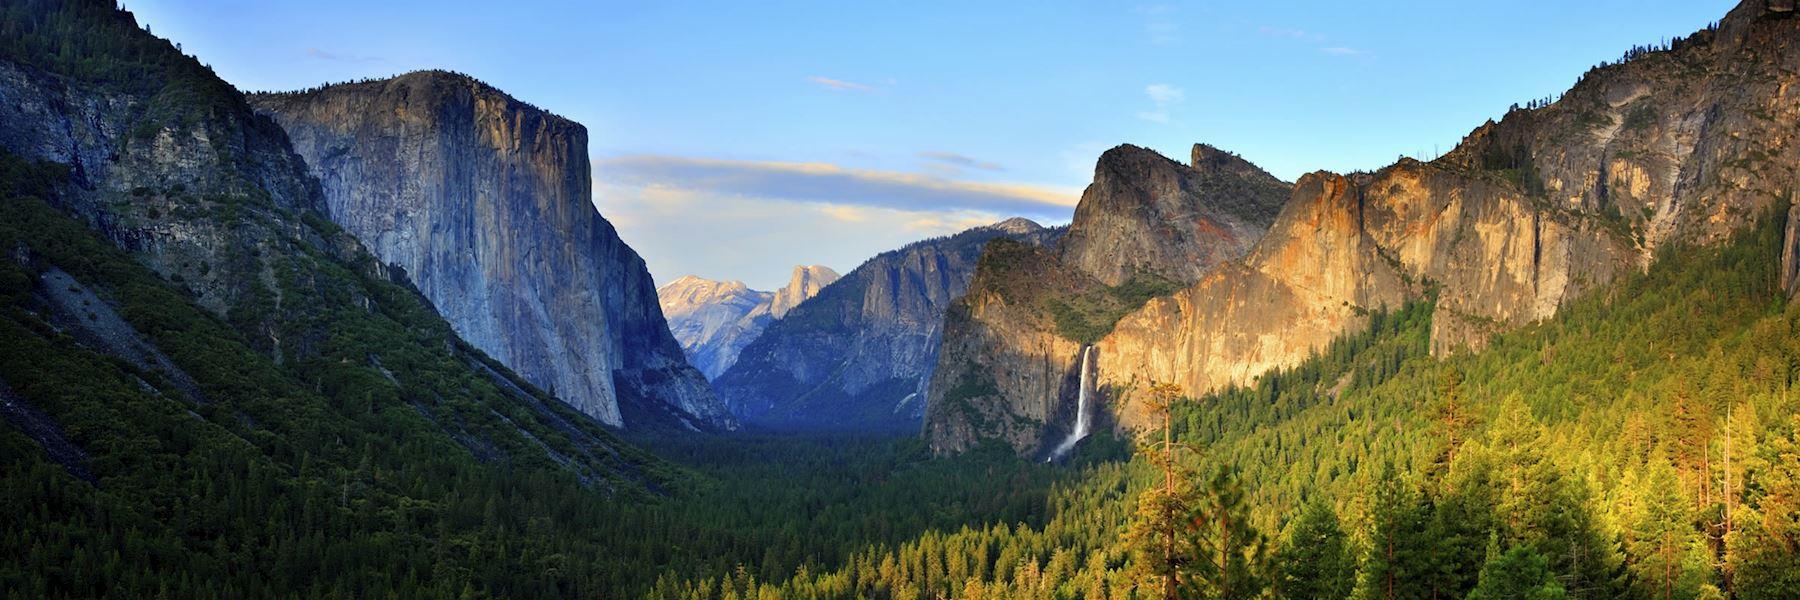 California travel guides